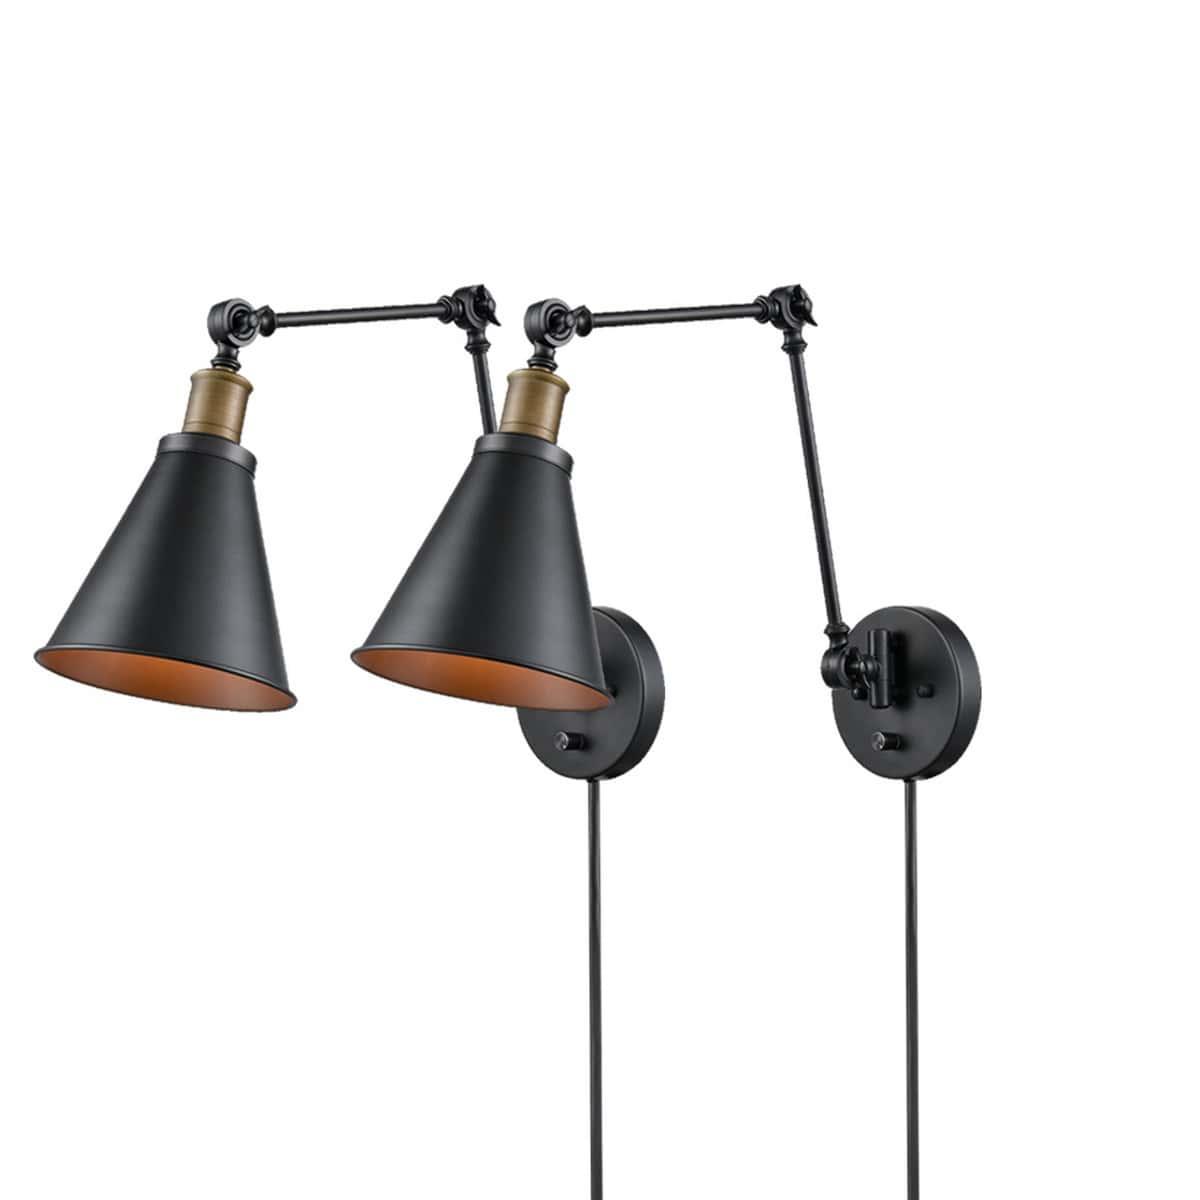 Industrial Swing Arm Plug-in Wall Light Black 2 Pack Fixture